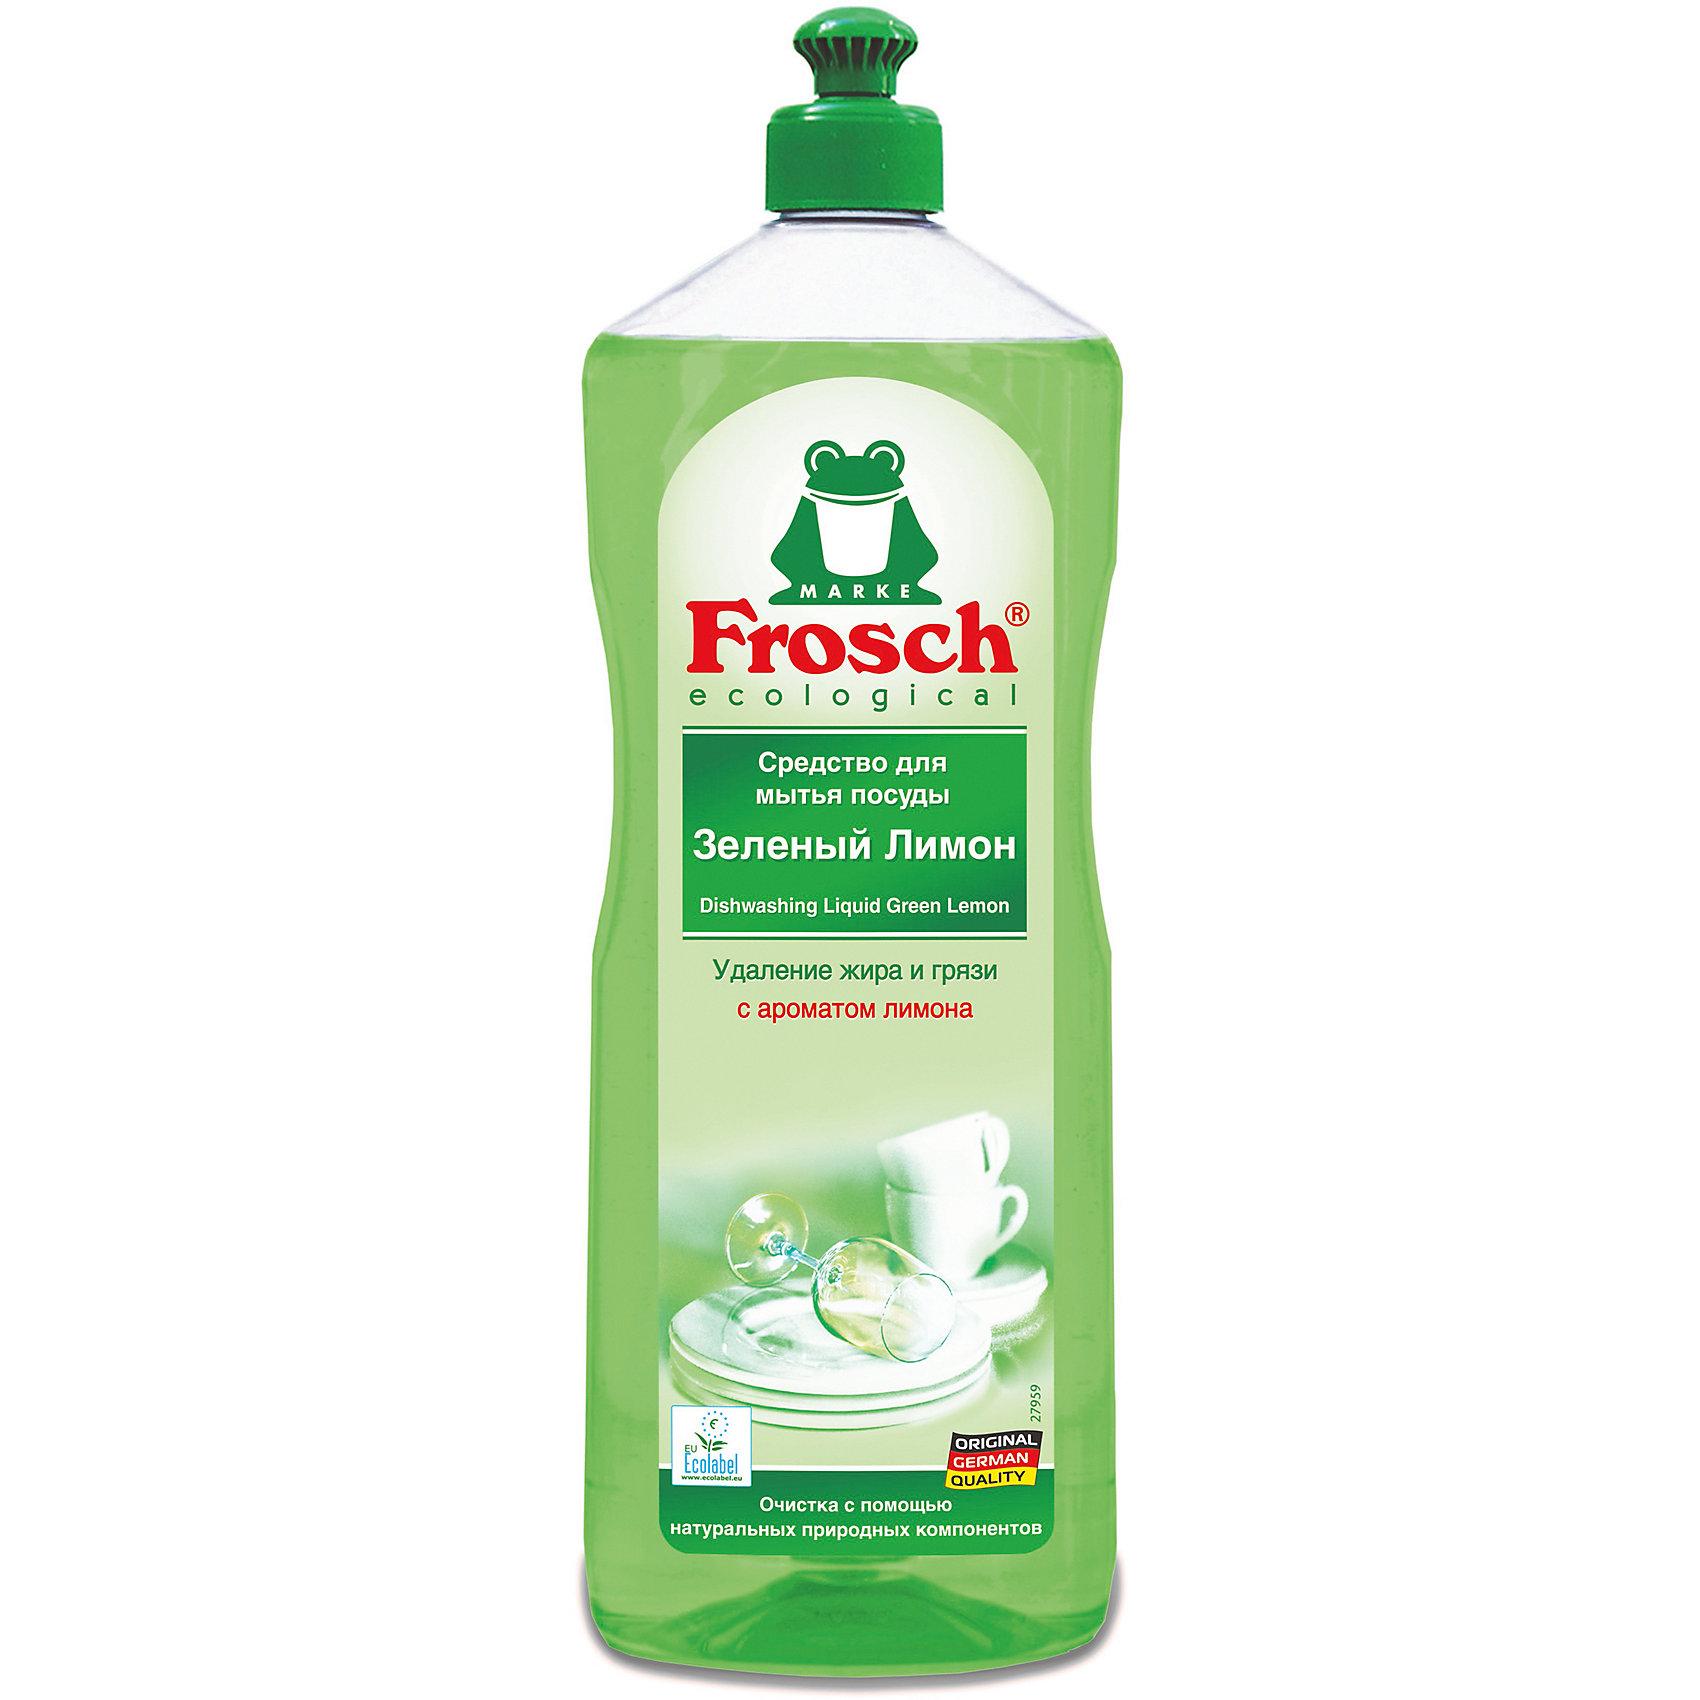 - Средство для мытья посуды (зеленый лимон), 1 л., Frosch бальзам для мытья посуды зеленый чай frosch 0 5 л